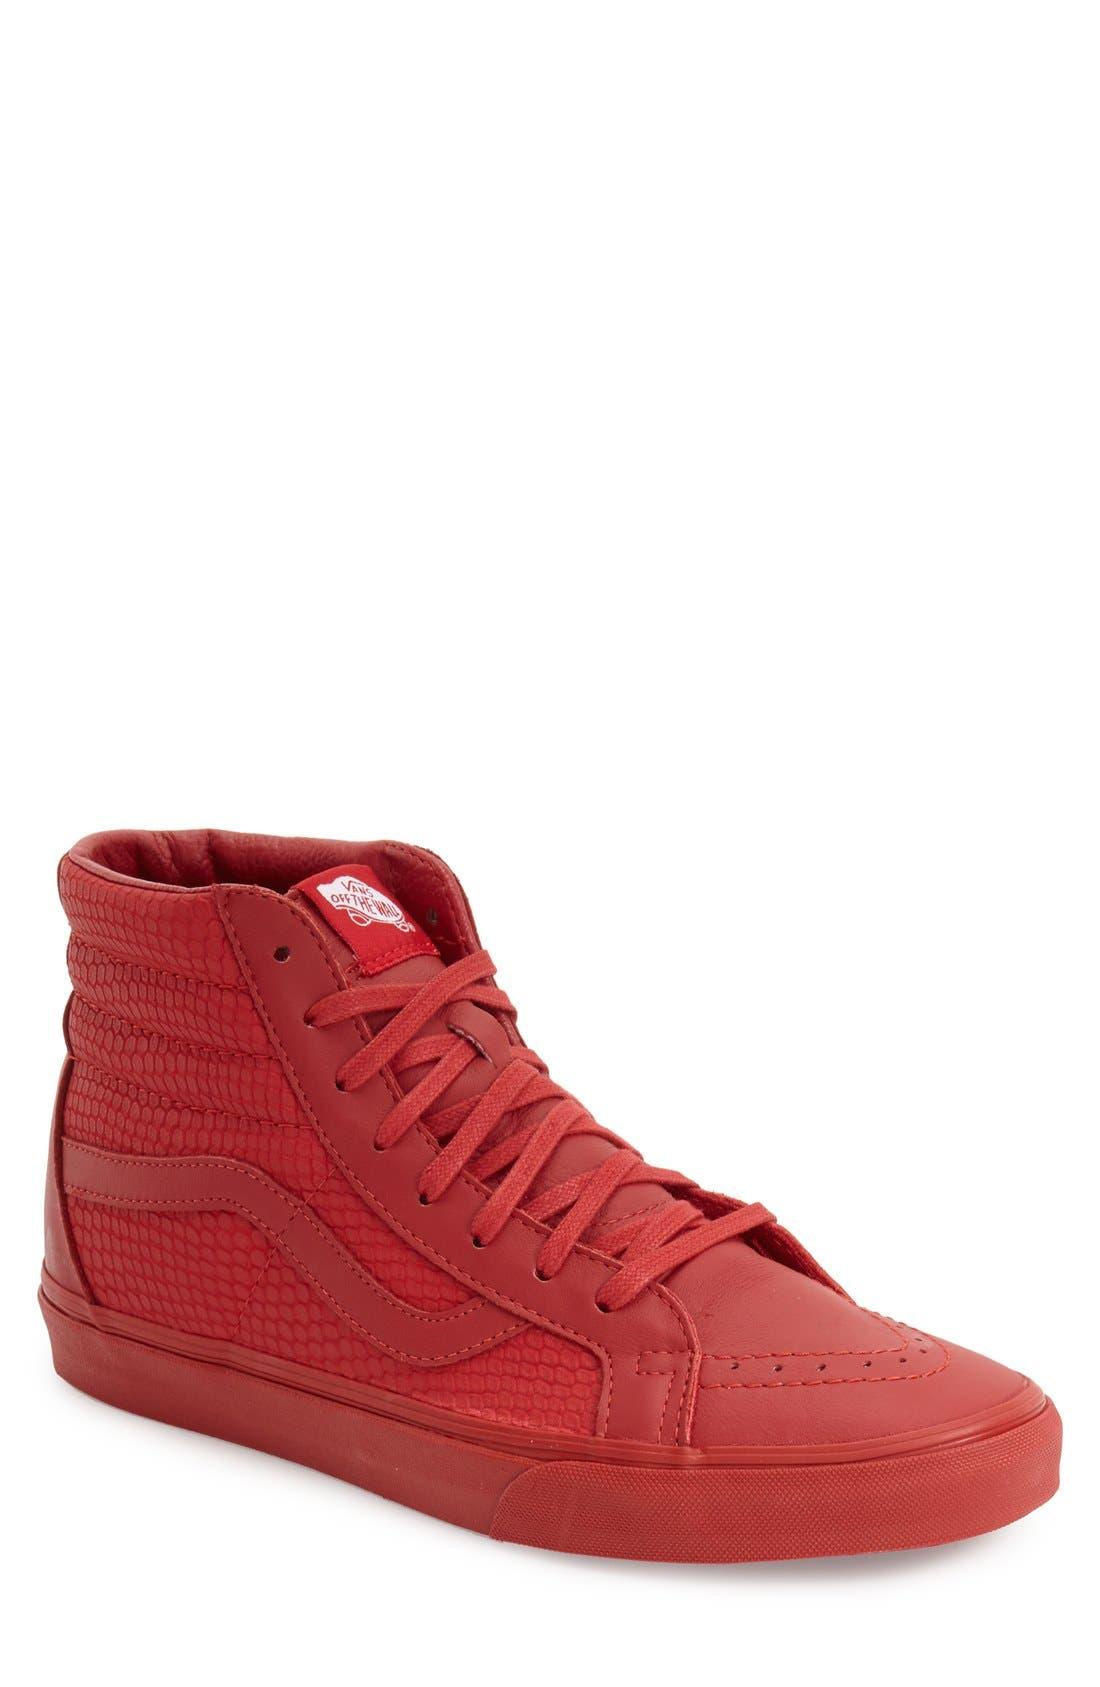 Main Image - Vans 'Sk8-Hi Reissue Plus' Sneaker (Men)